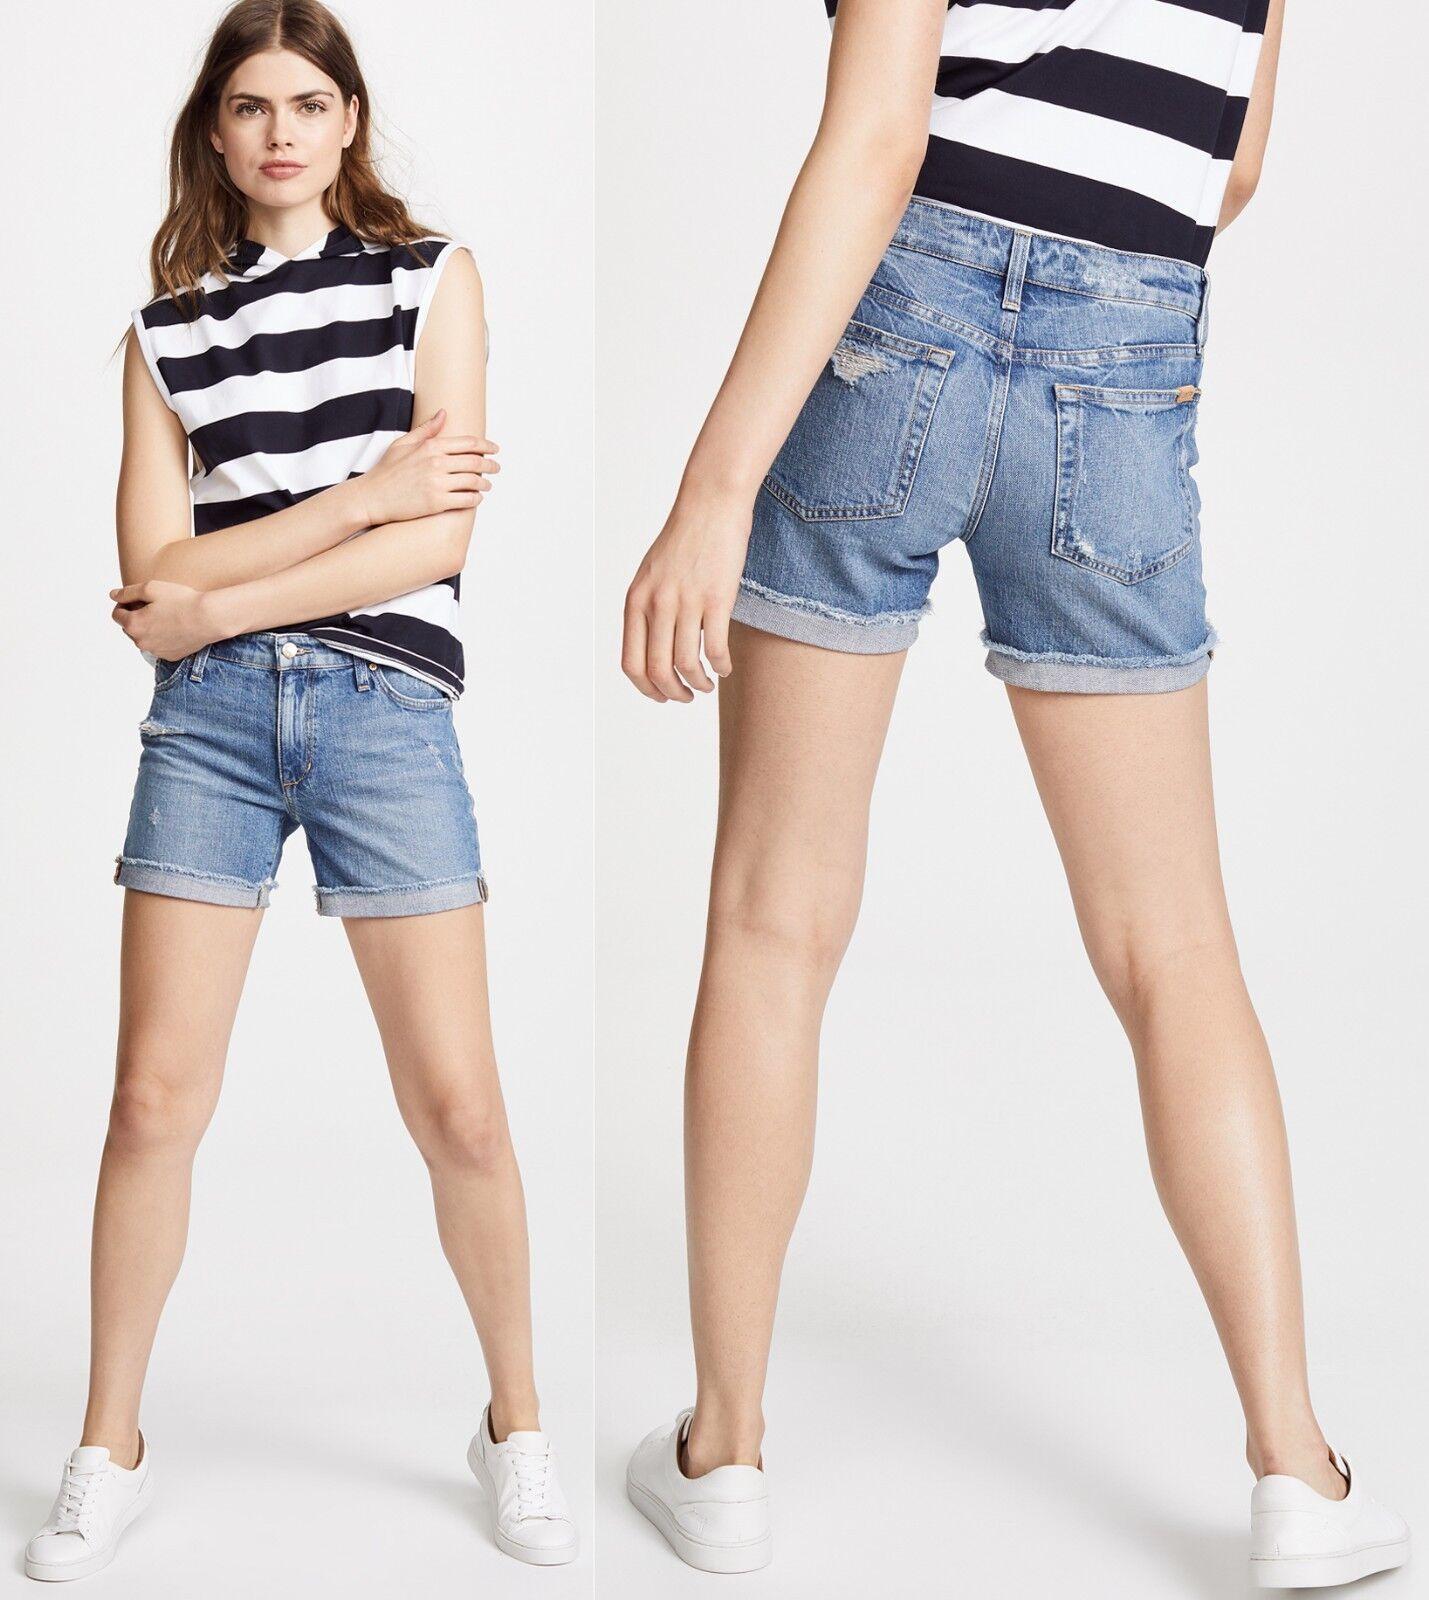 158 Joe's Jeans Lannah Wash Short cuffed Bermuda Denim Shorts